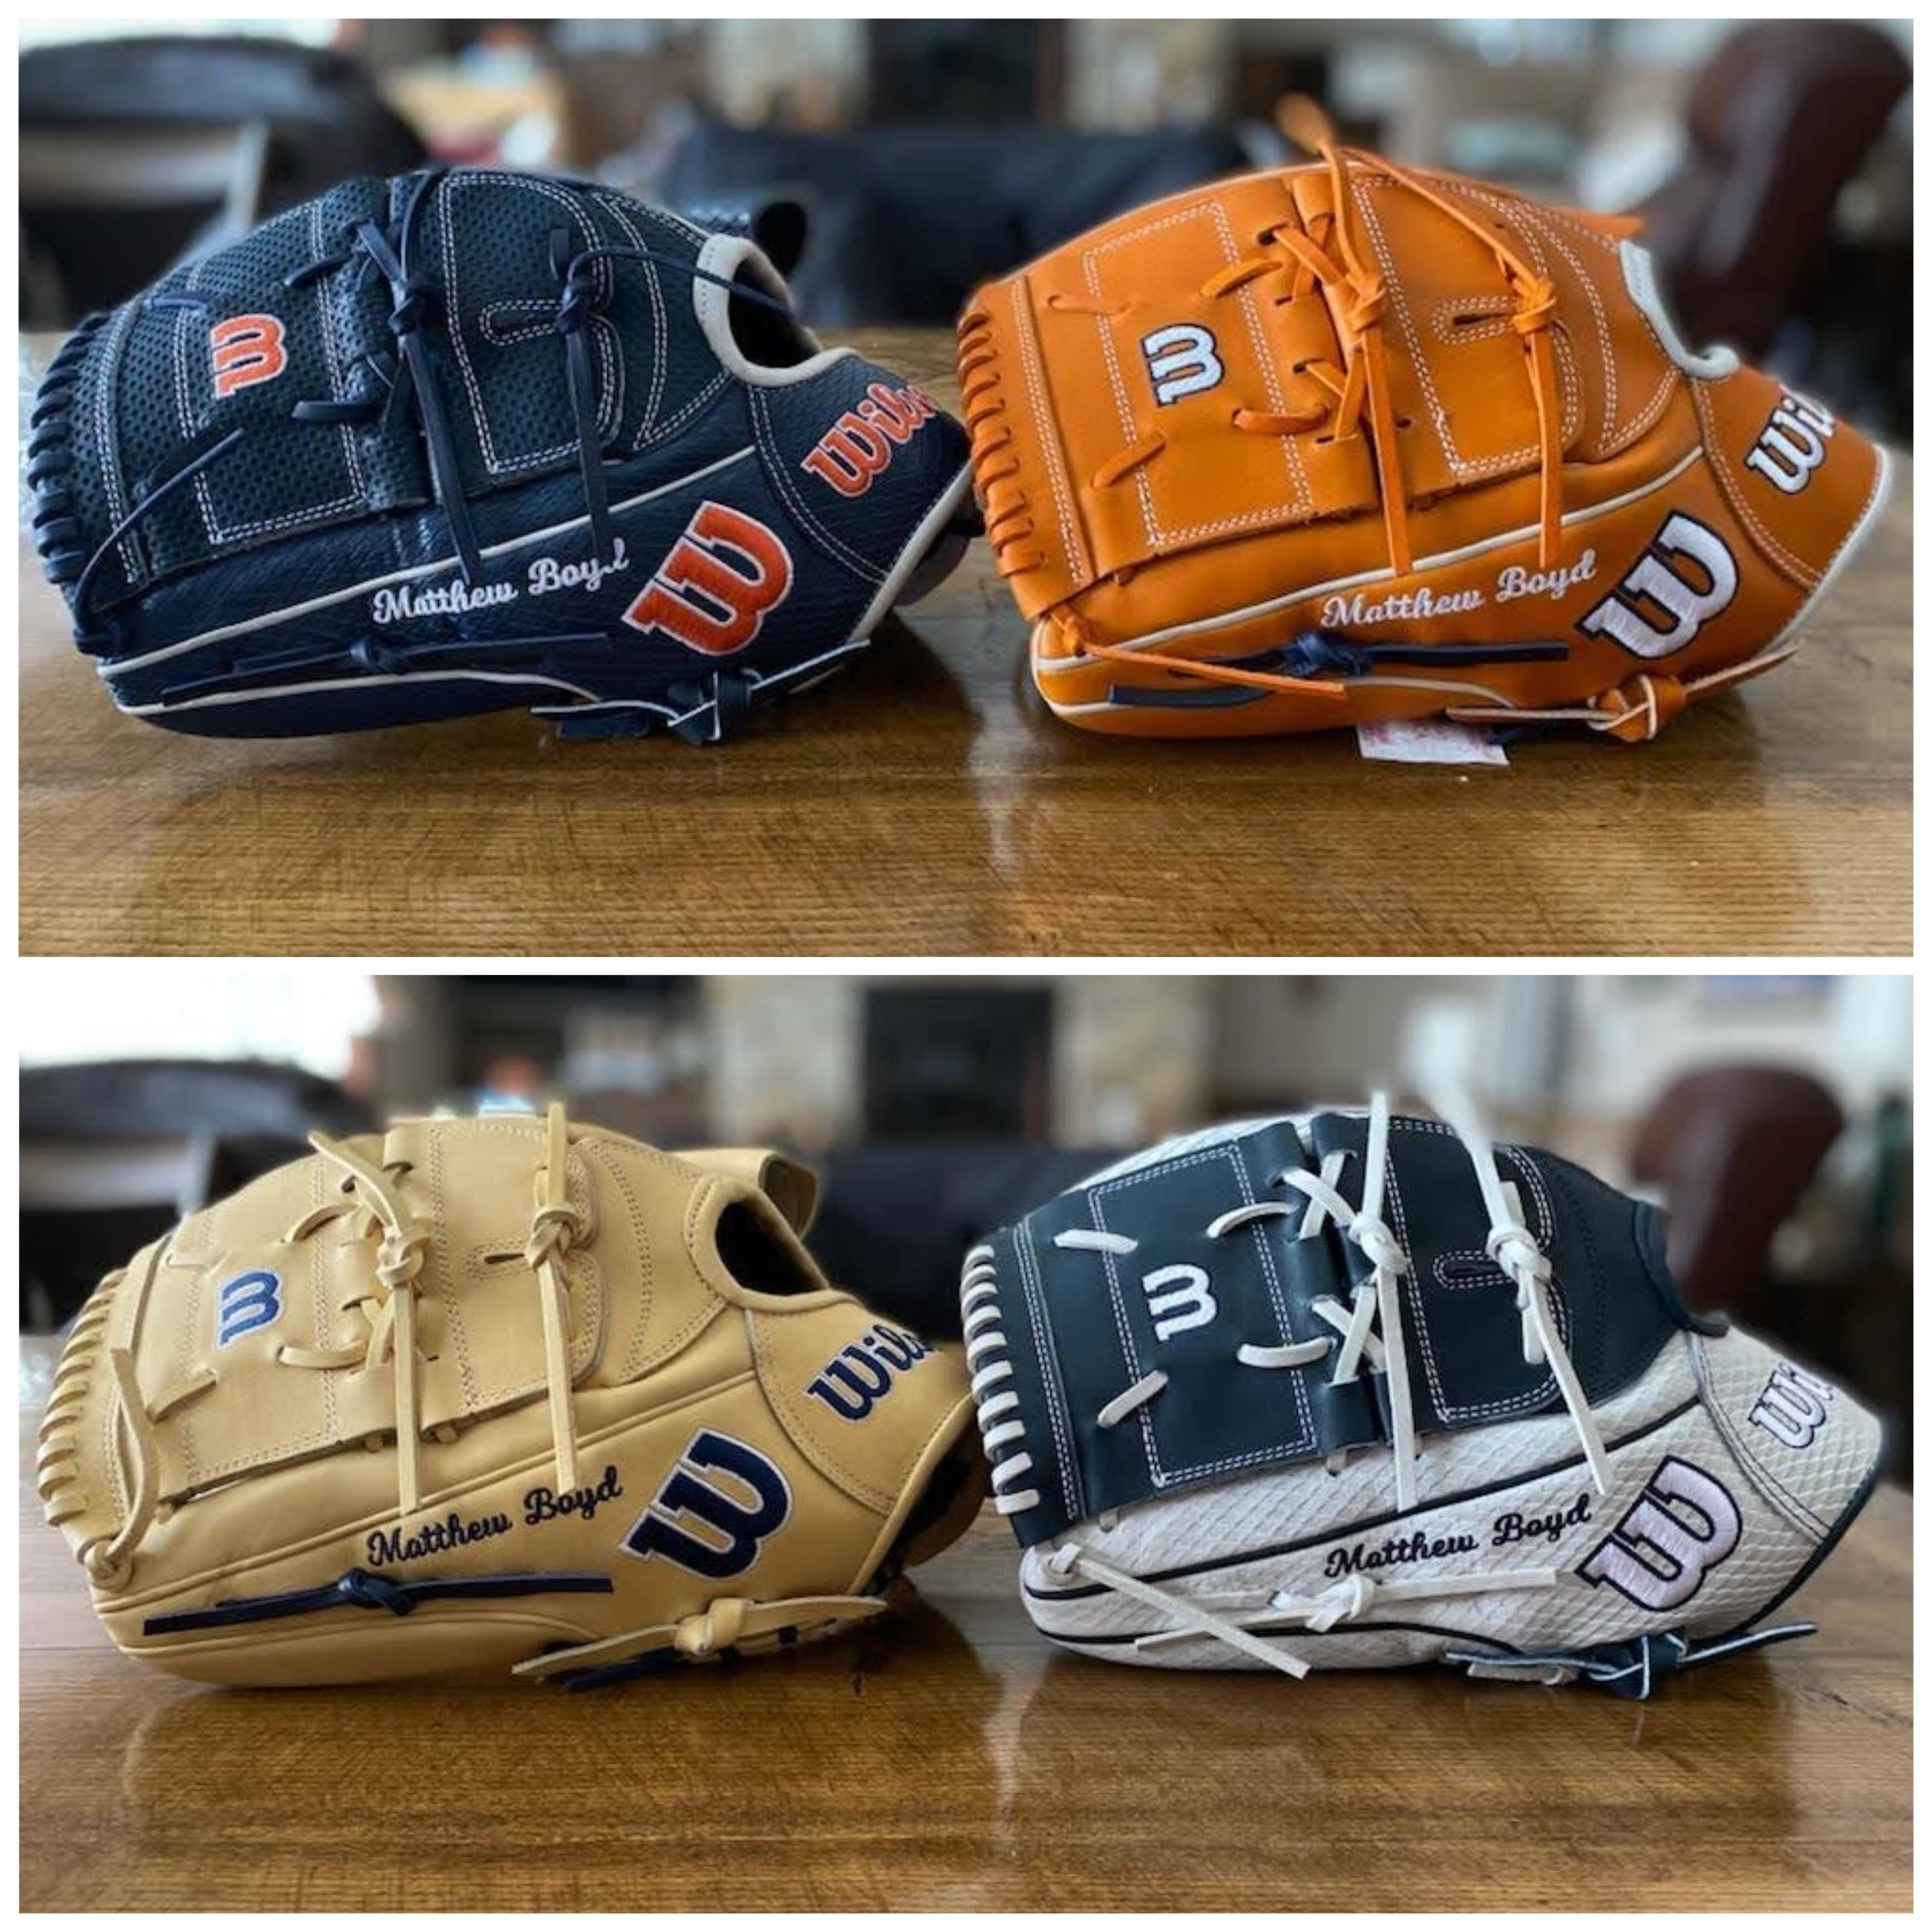 matt boyd's gloves